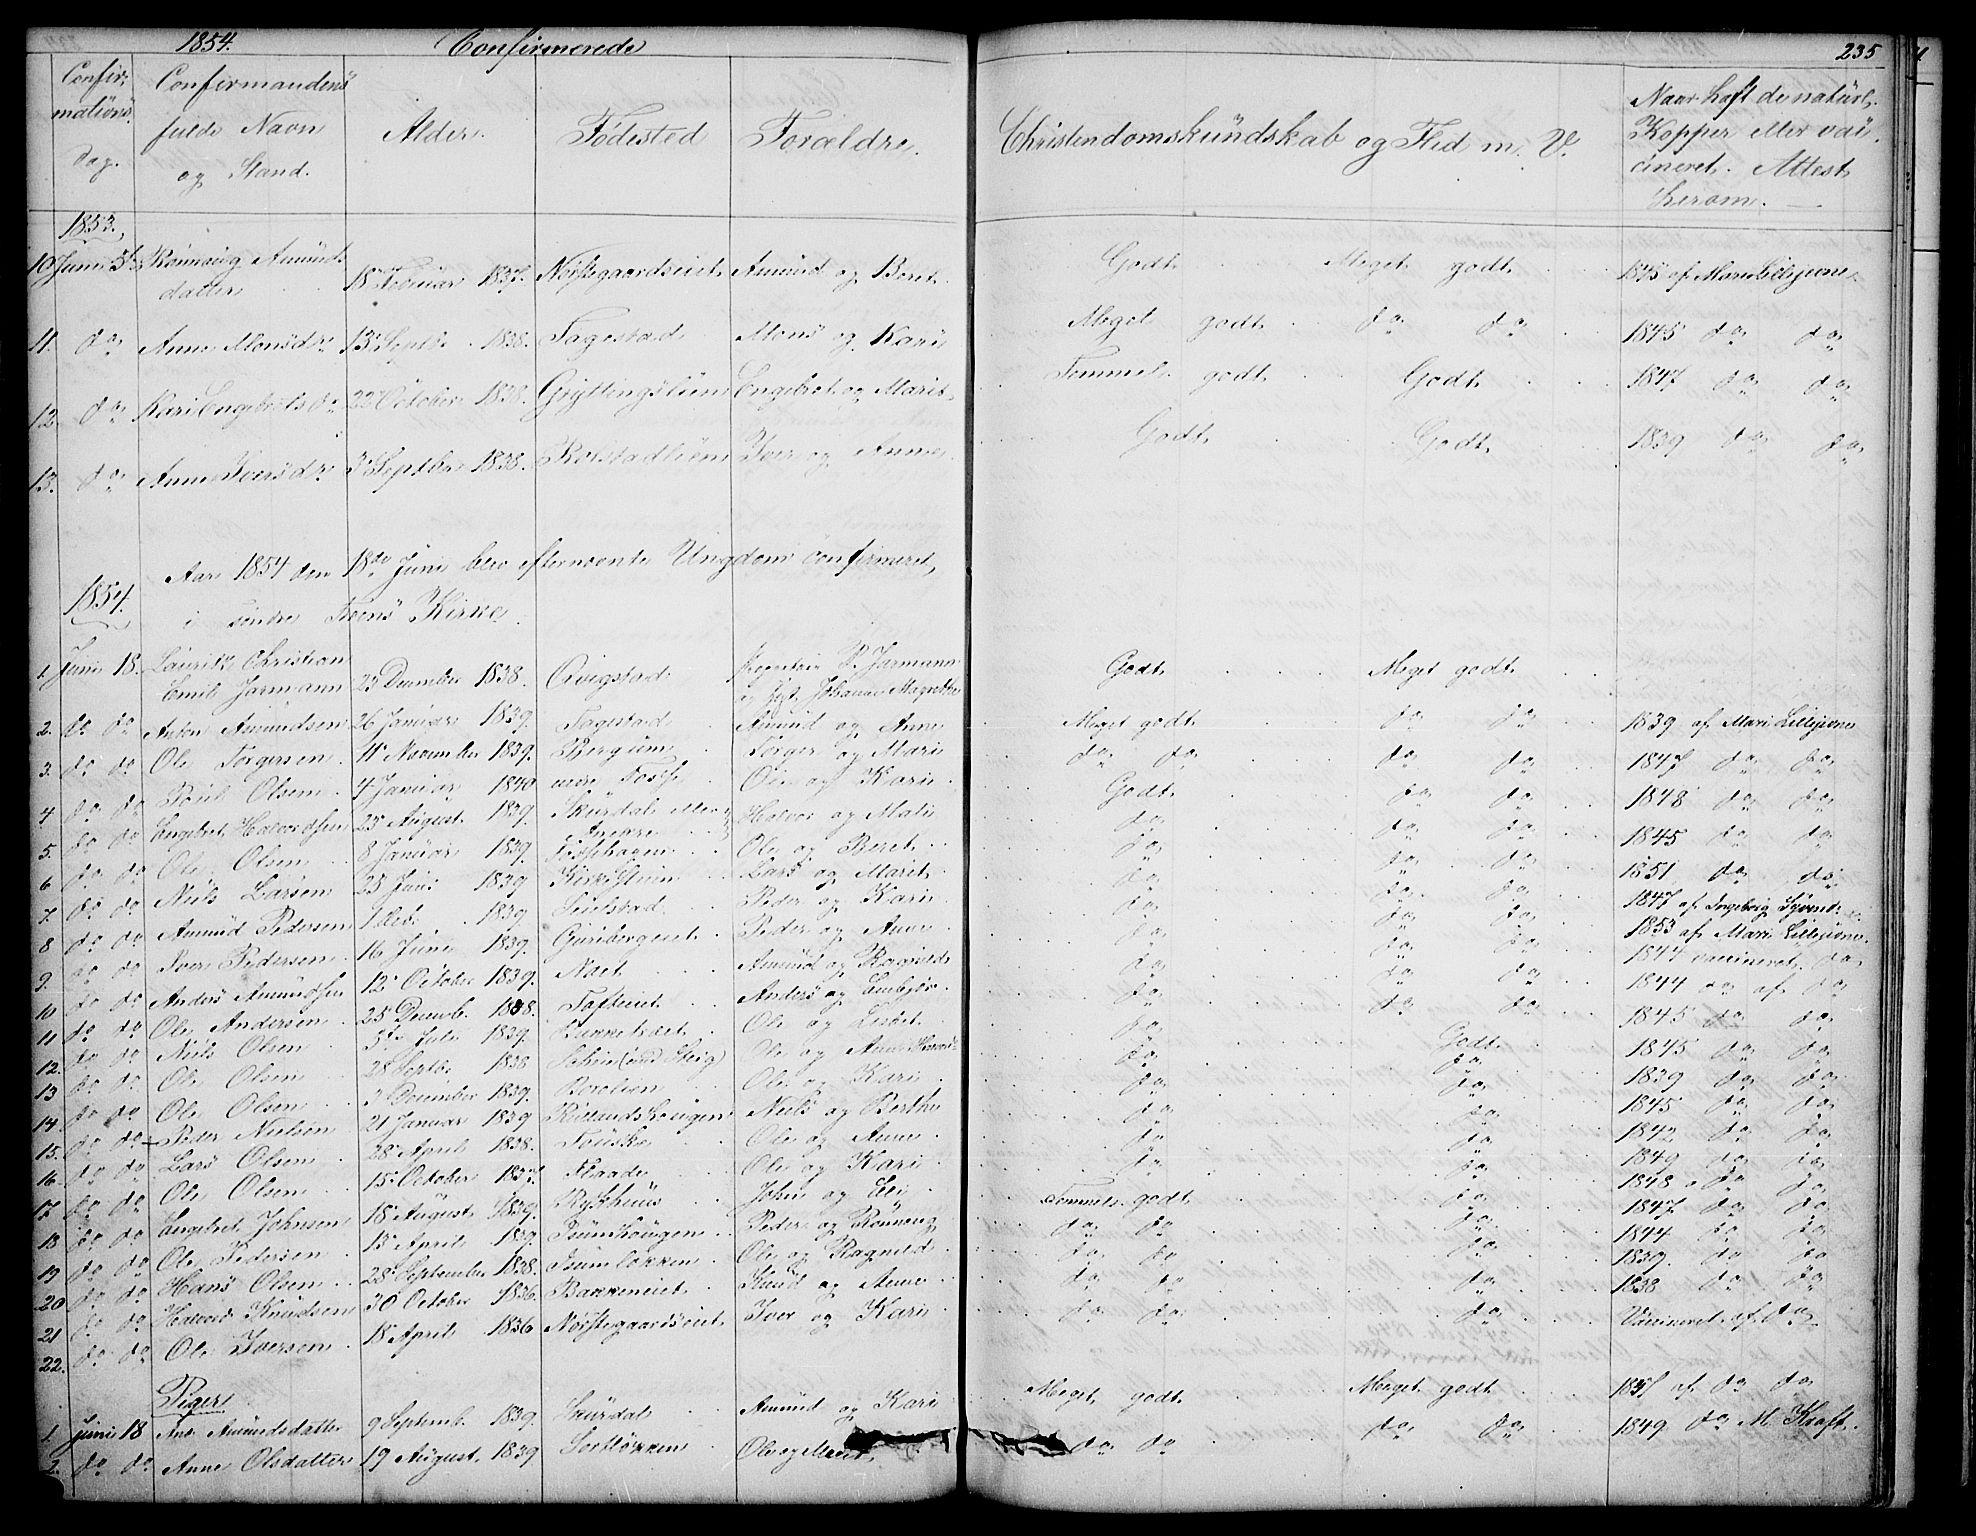 SAH, Sør-Fron prestekontor, H/Ha/Hab/L0001: Klokkerbok nr. 1, 1844-1863, s. 235